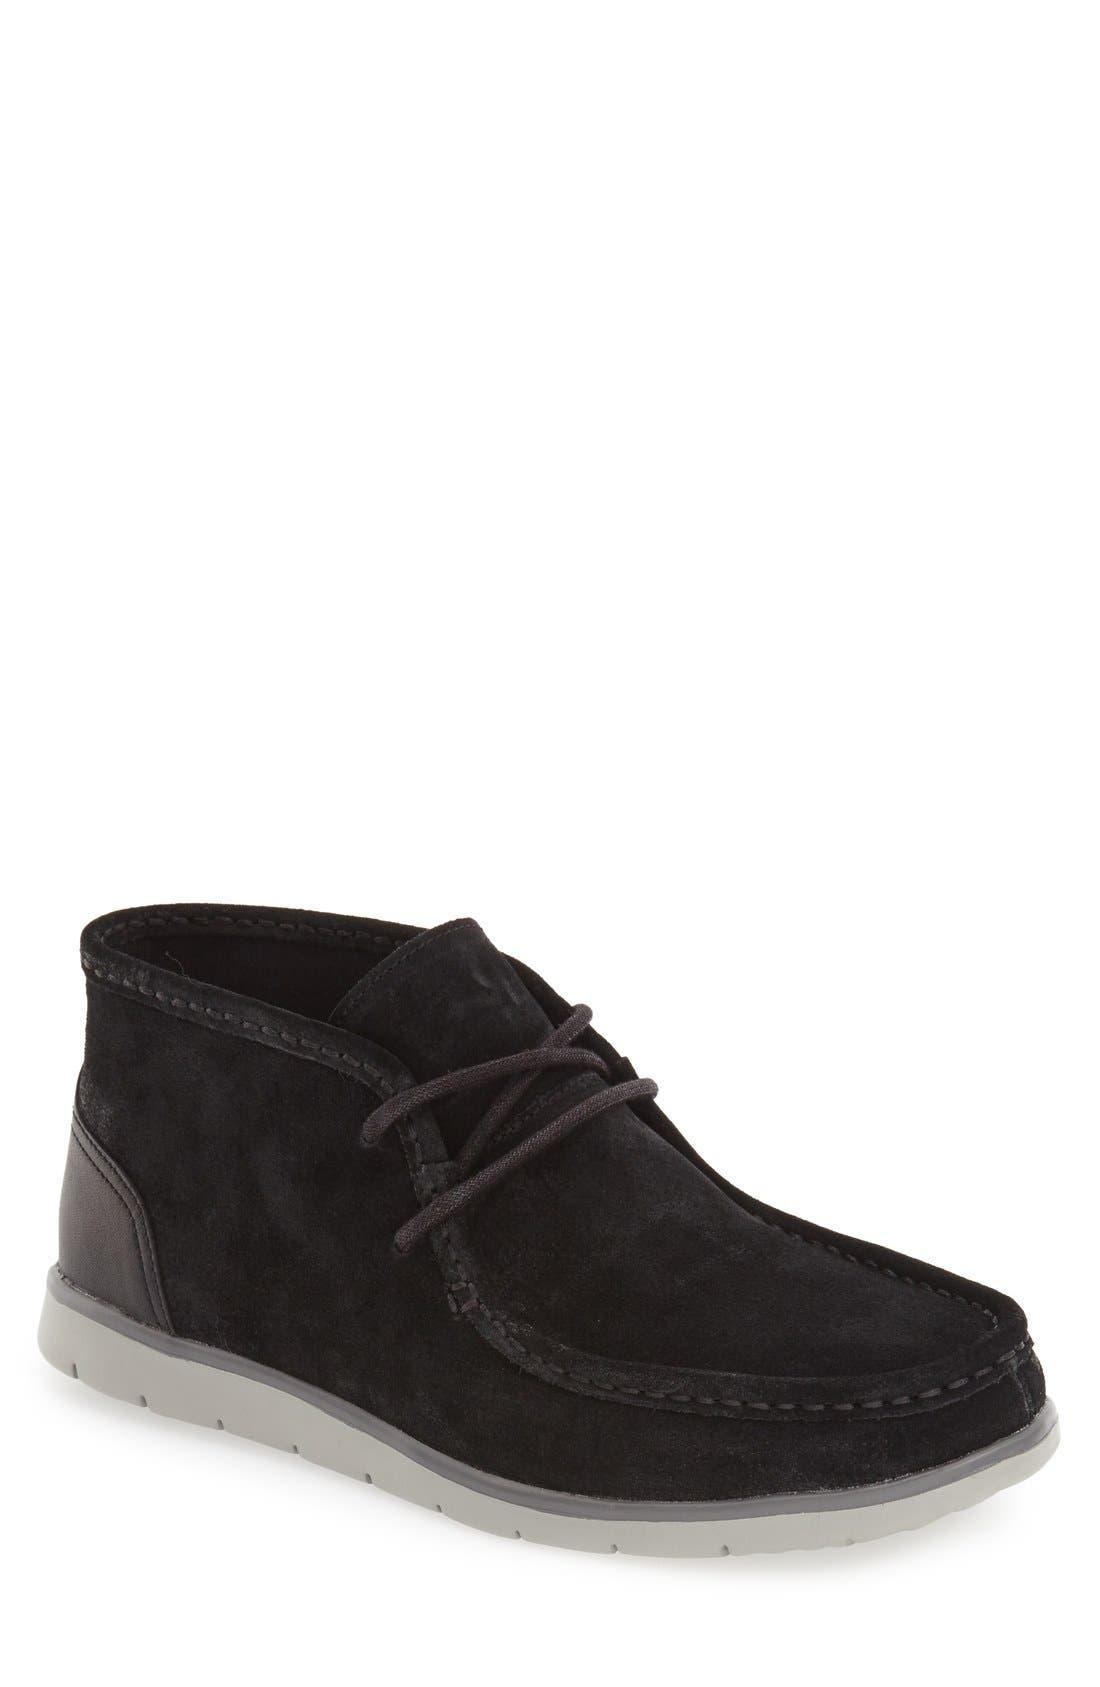 'Hendrickson' Chukka Boot,                         Main,                         color, 001